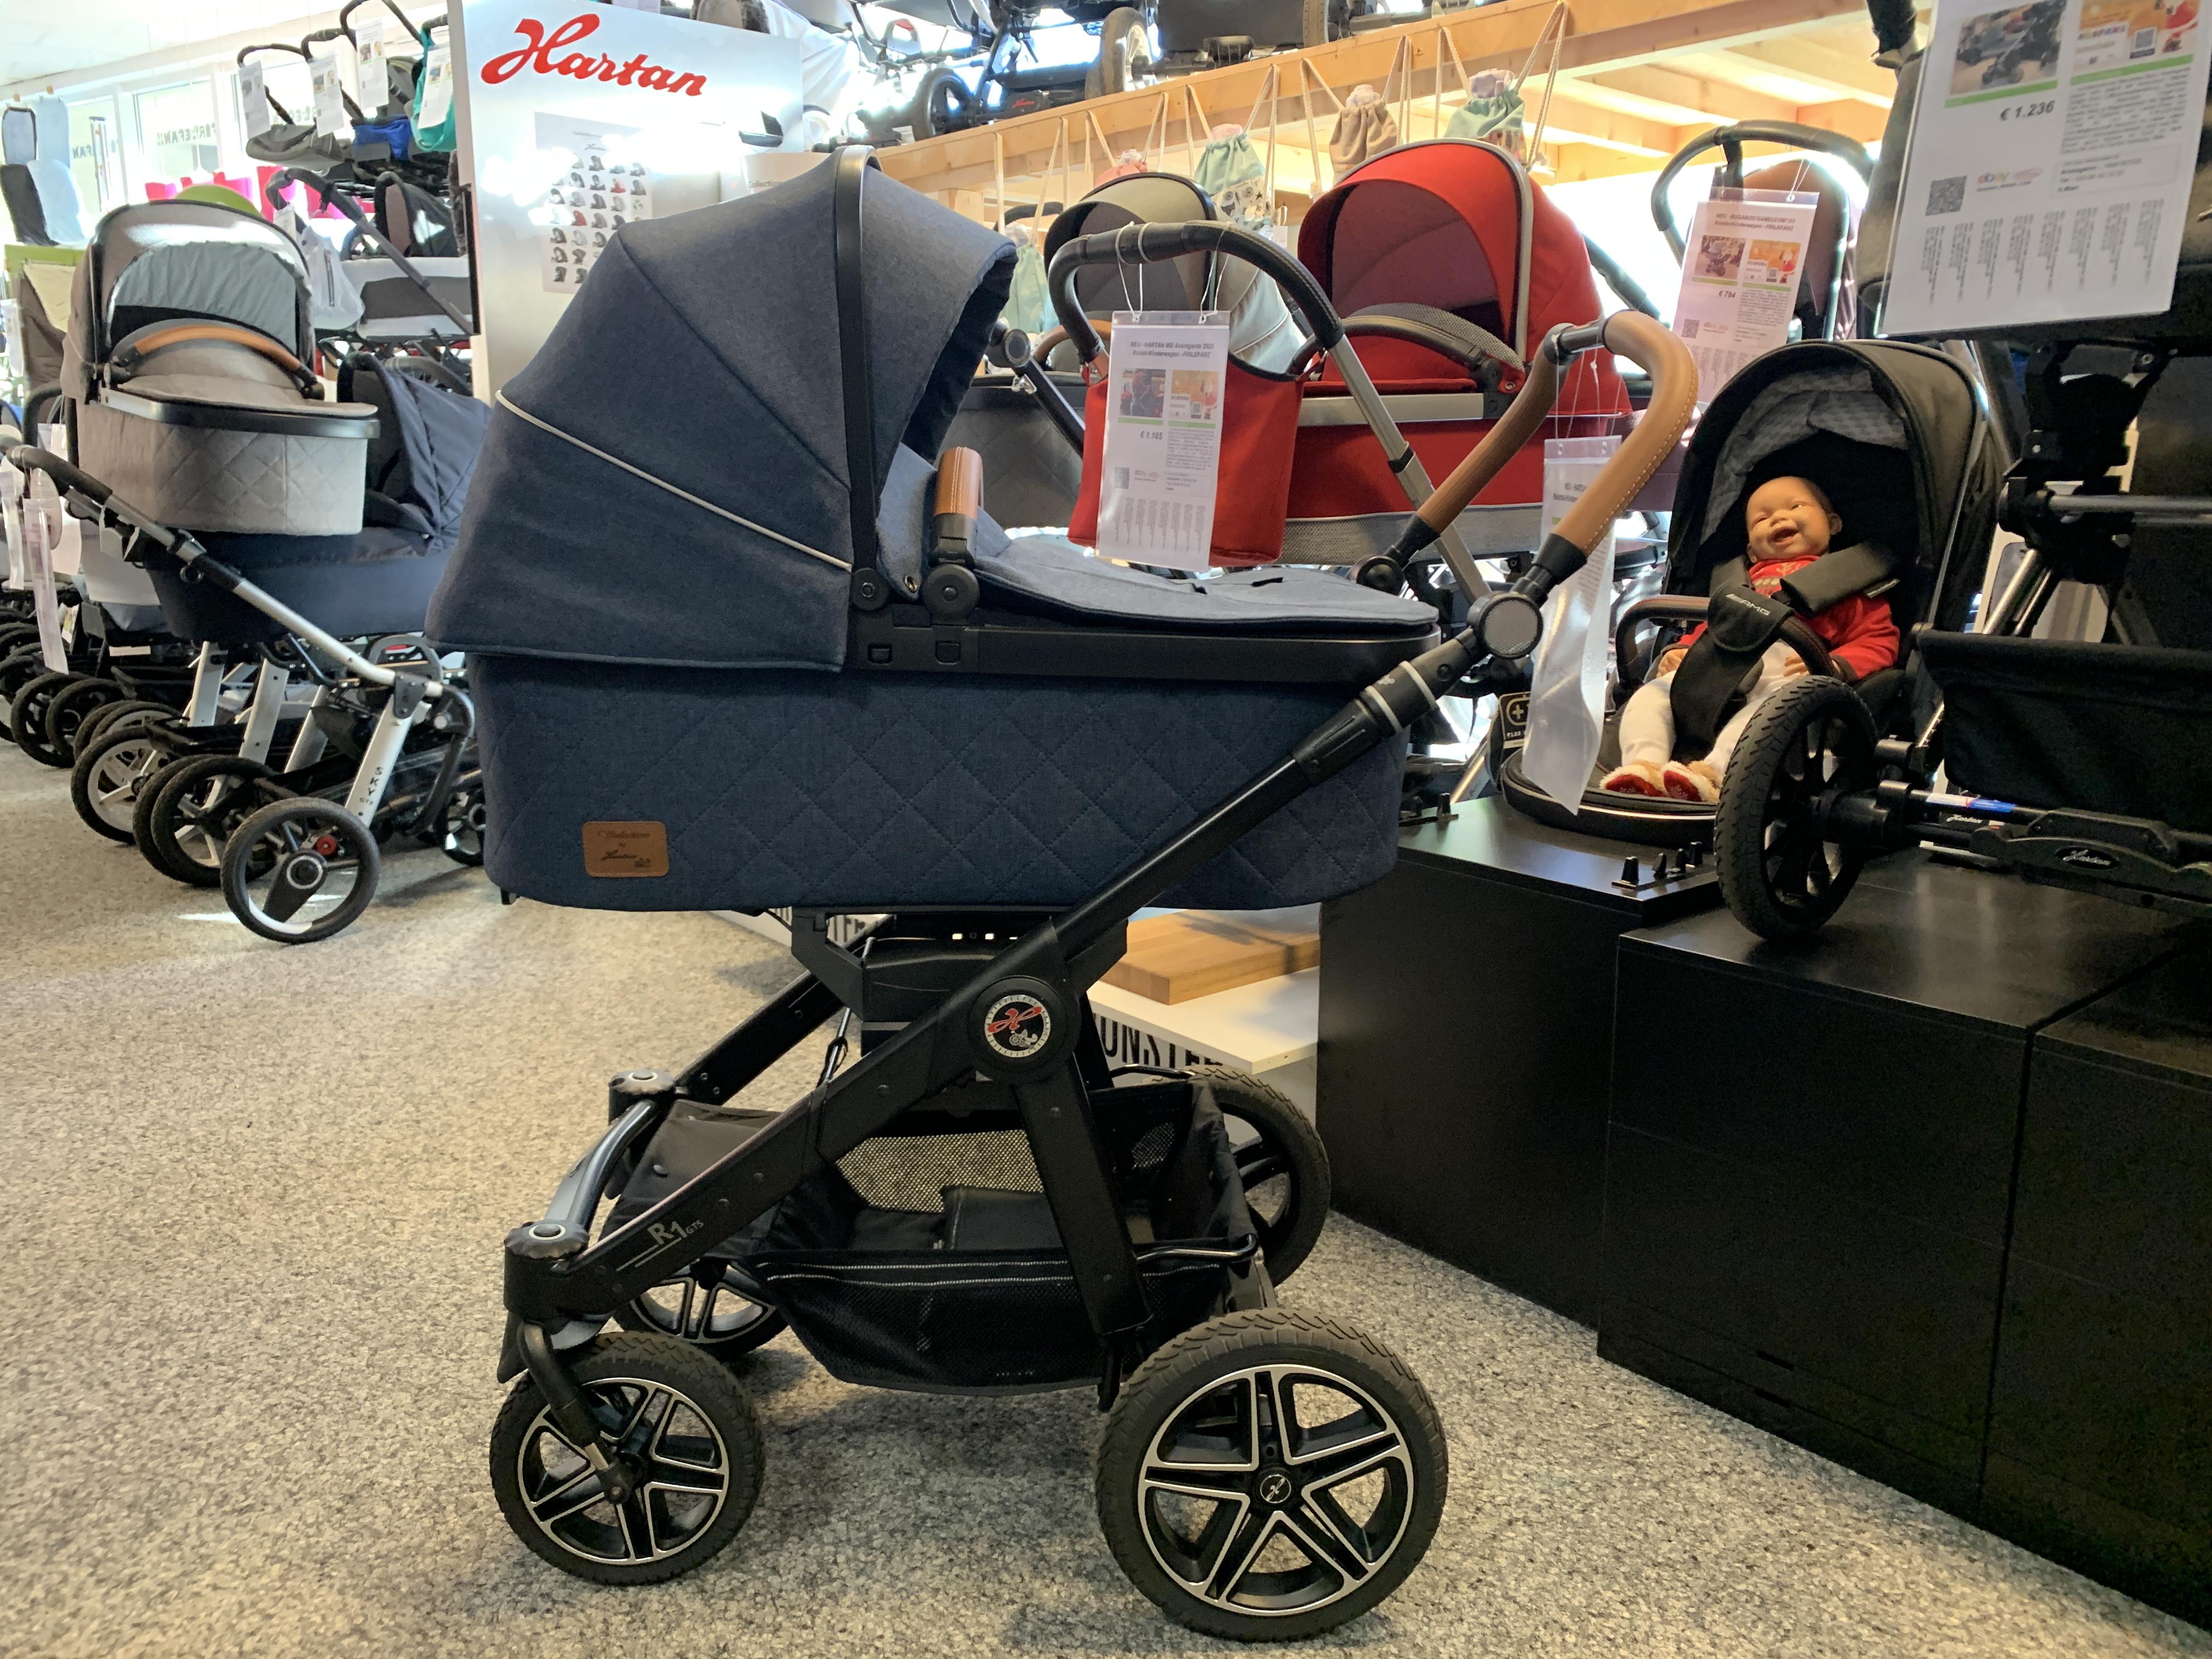 HARTAN R1 GTS (2021) Kombi-Kinderwagen